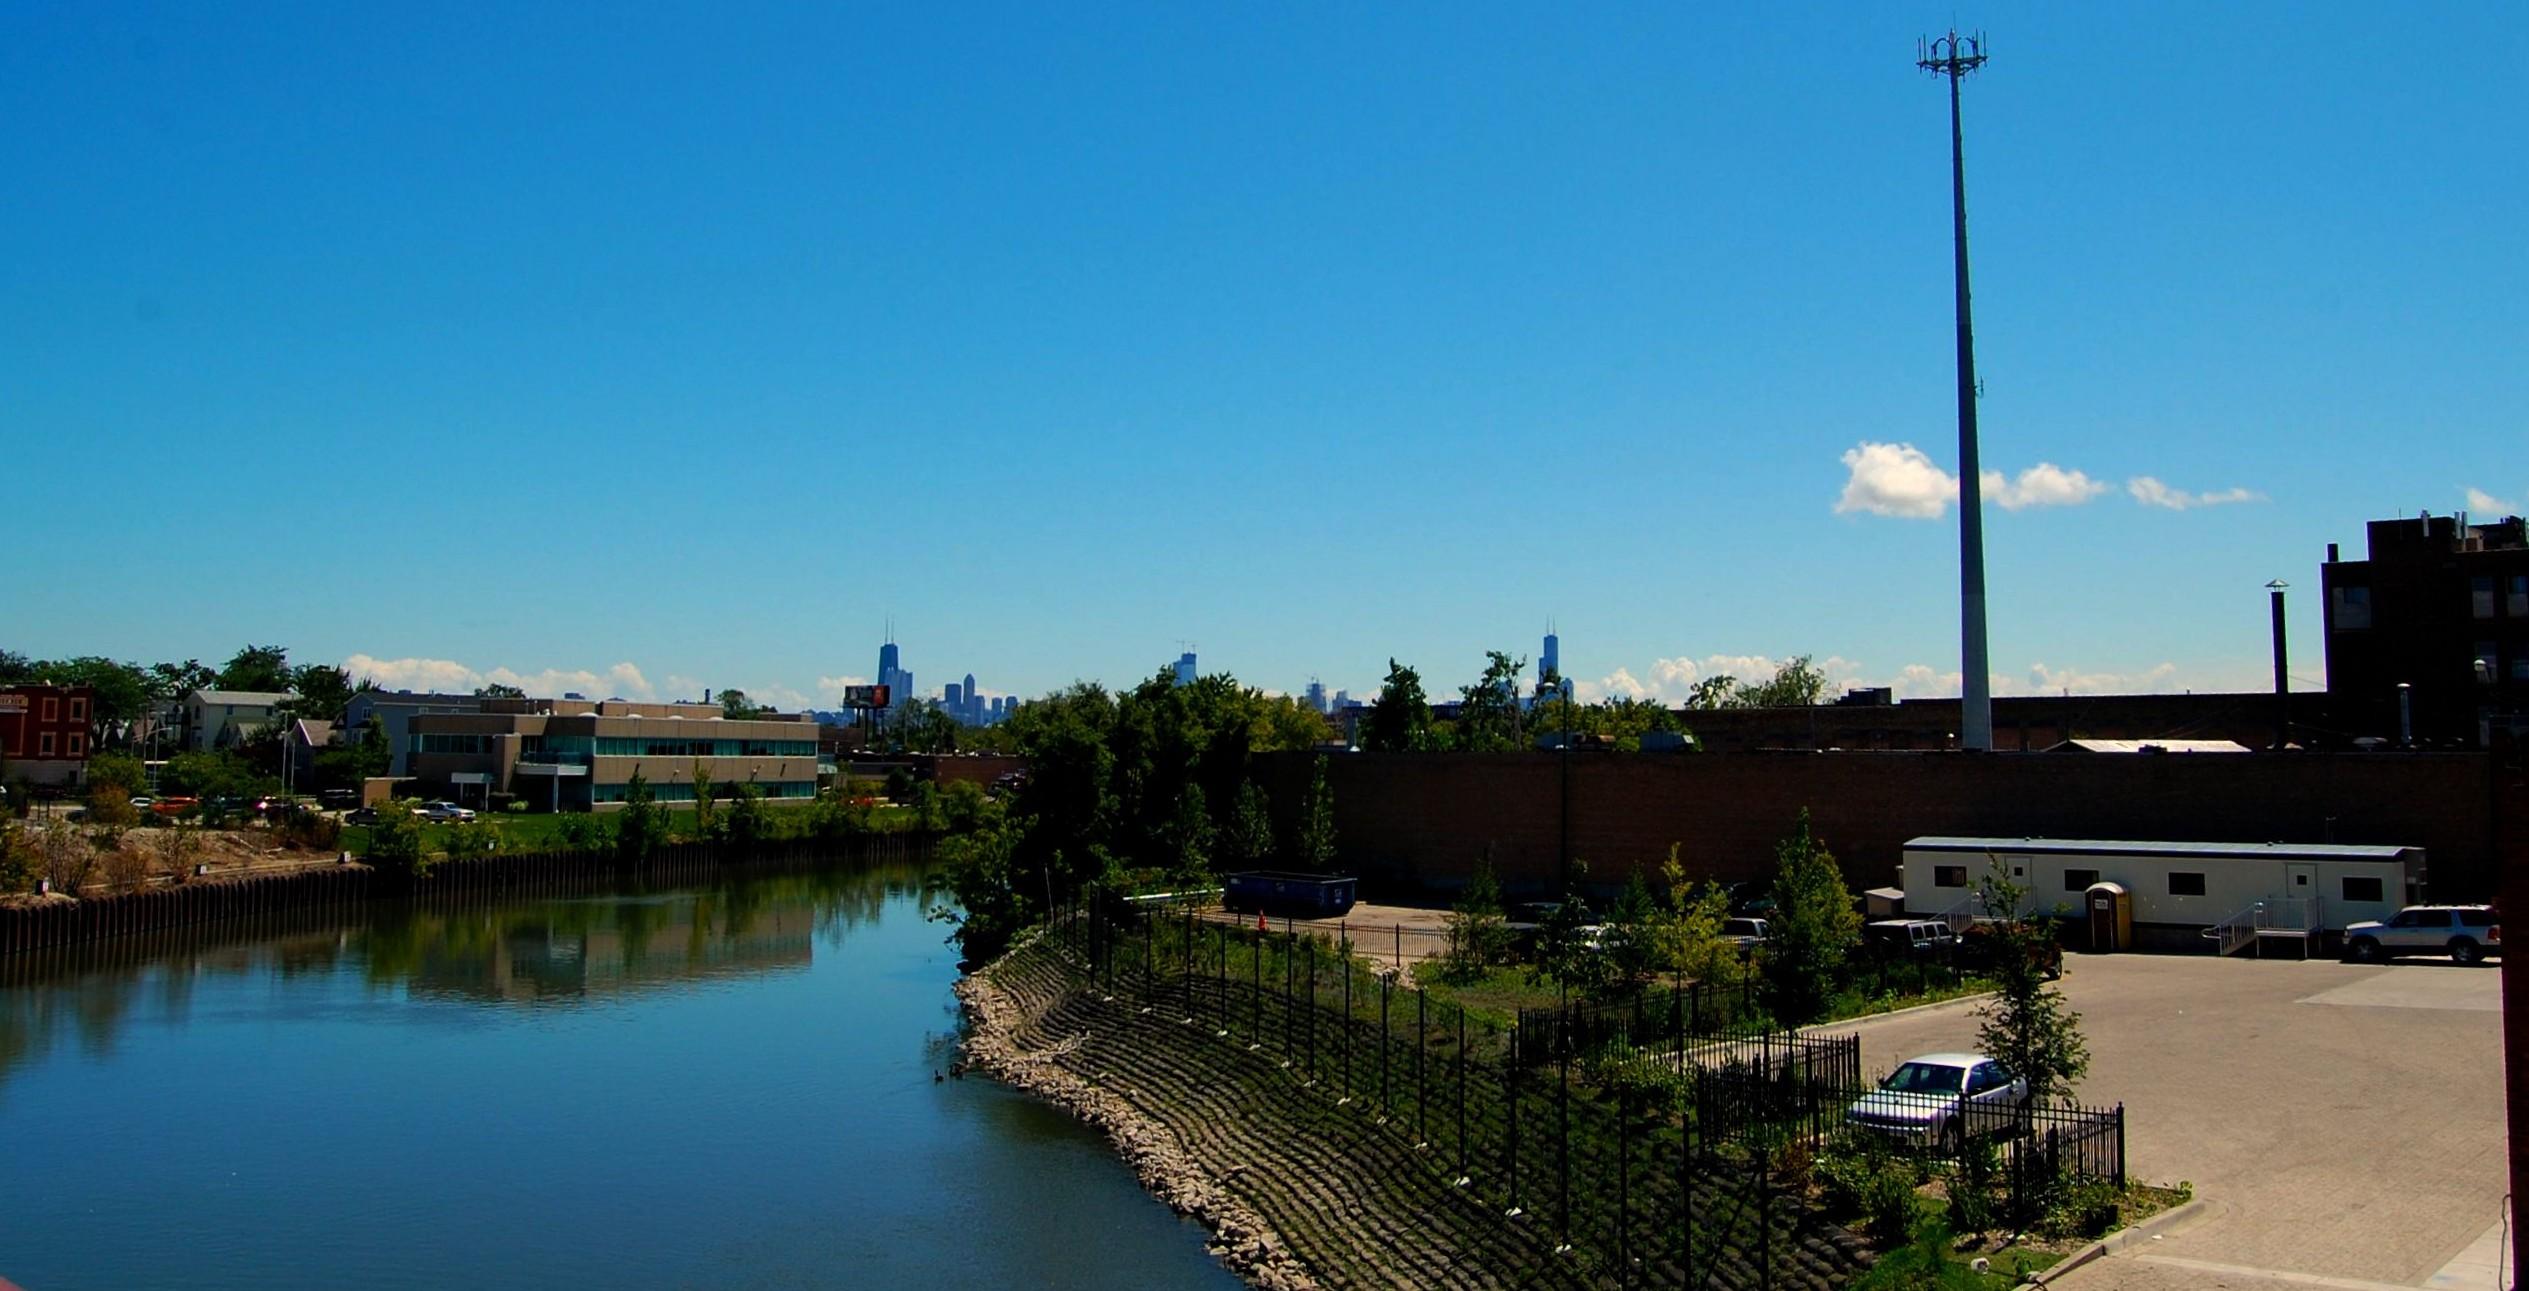 Development roundup: Avondale, near the river